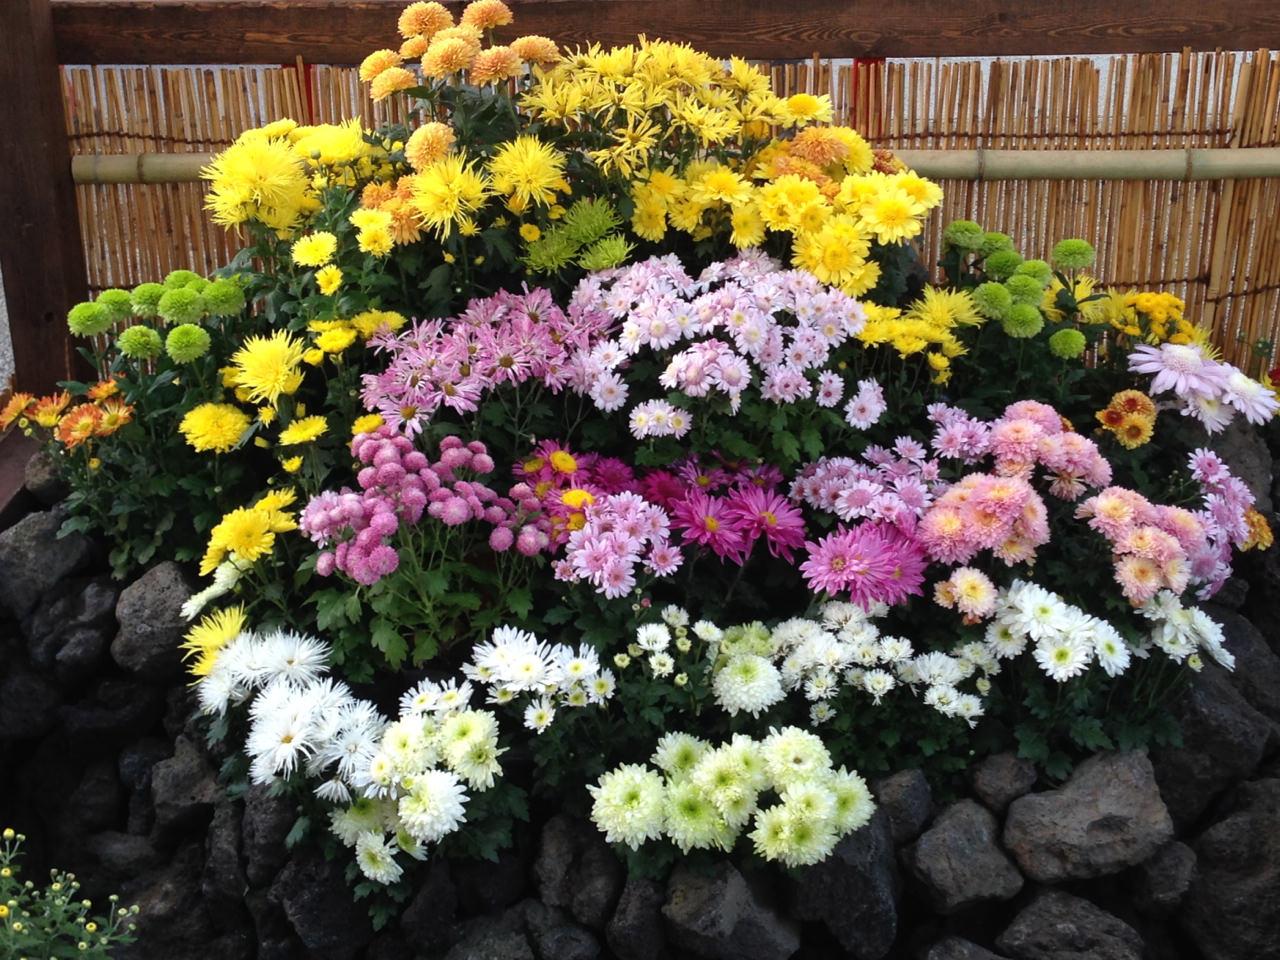 Chrysanthemum Exhibitions Enjoy Japanese Flowers In Autumn Deepjapan